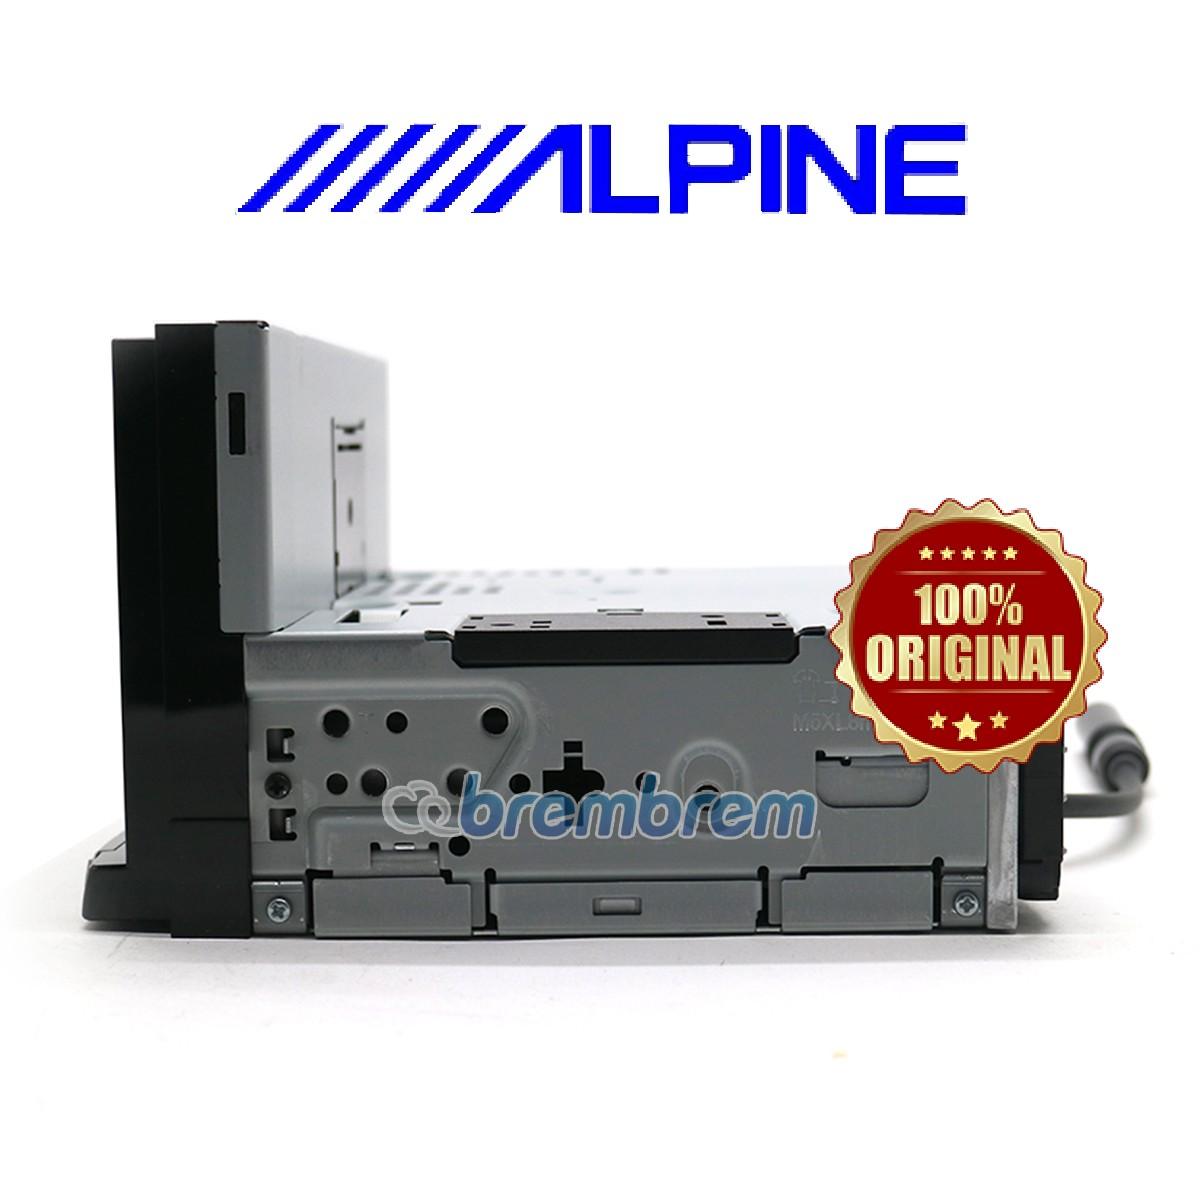 ALPINE iLX-702D - HEAD UNIT DOUBLE DIN